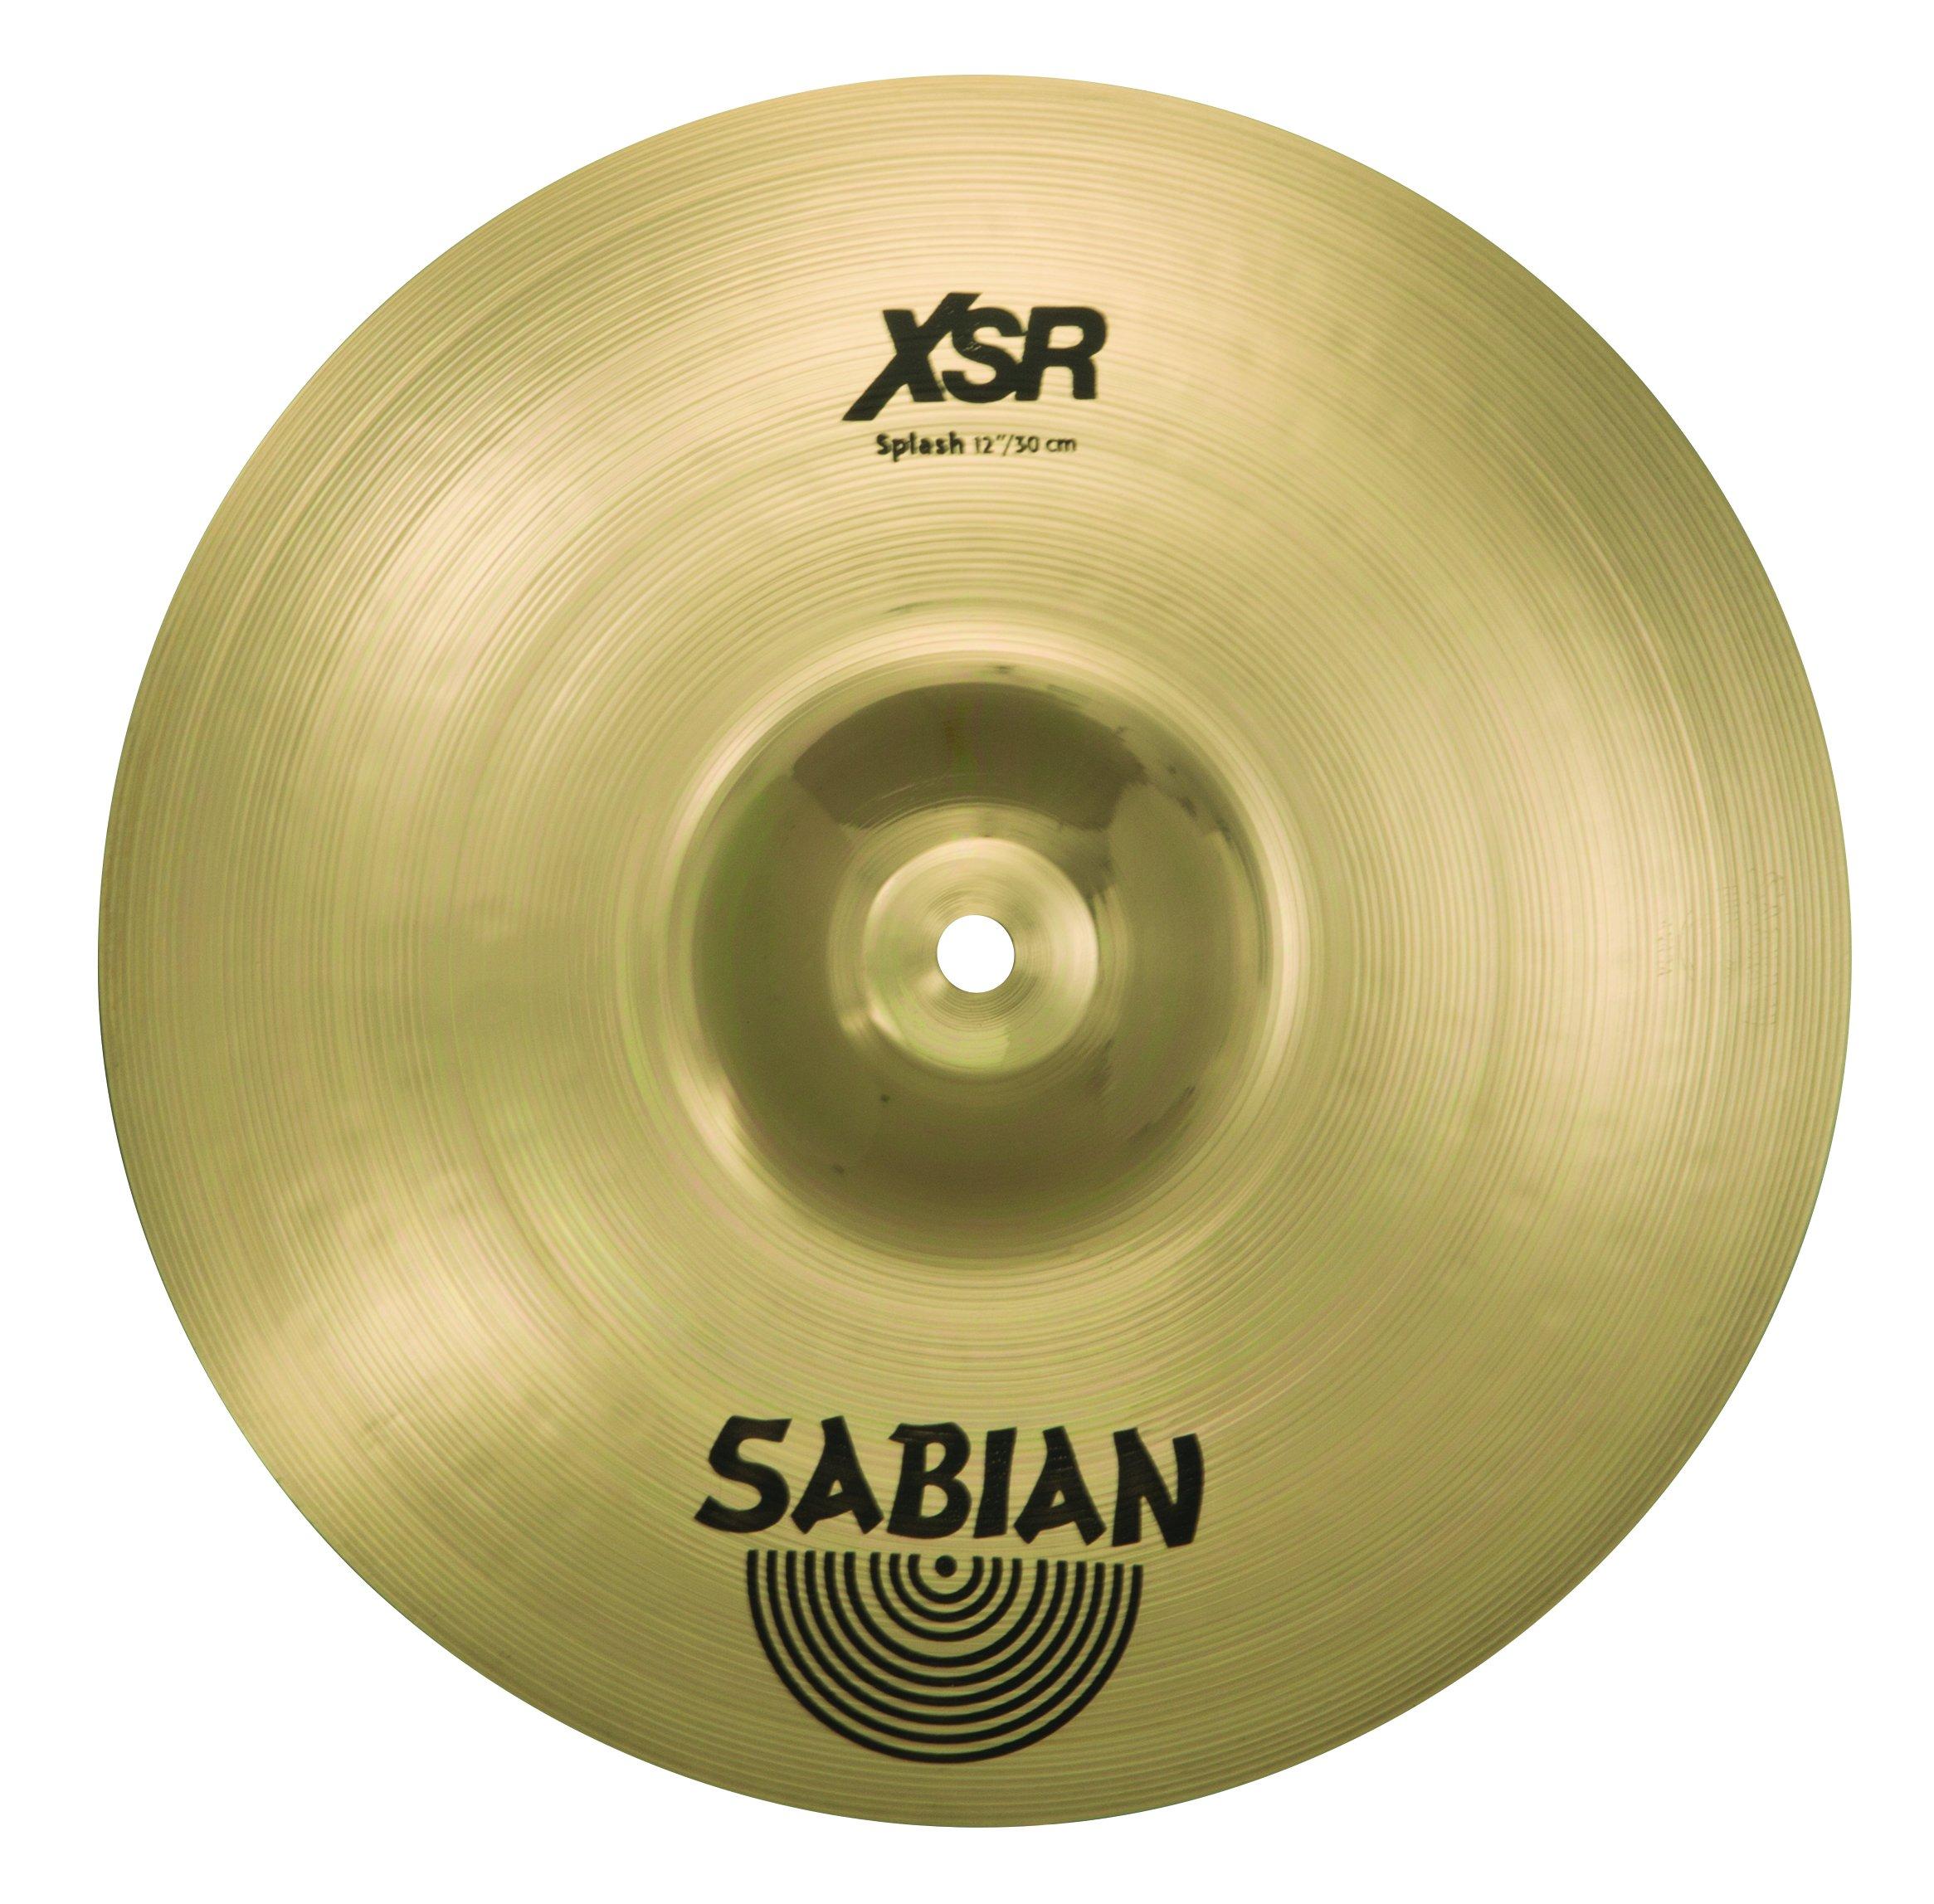 Sabian Cymbal Variety Package, inch (XSR1205B) by Sabian